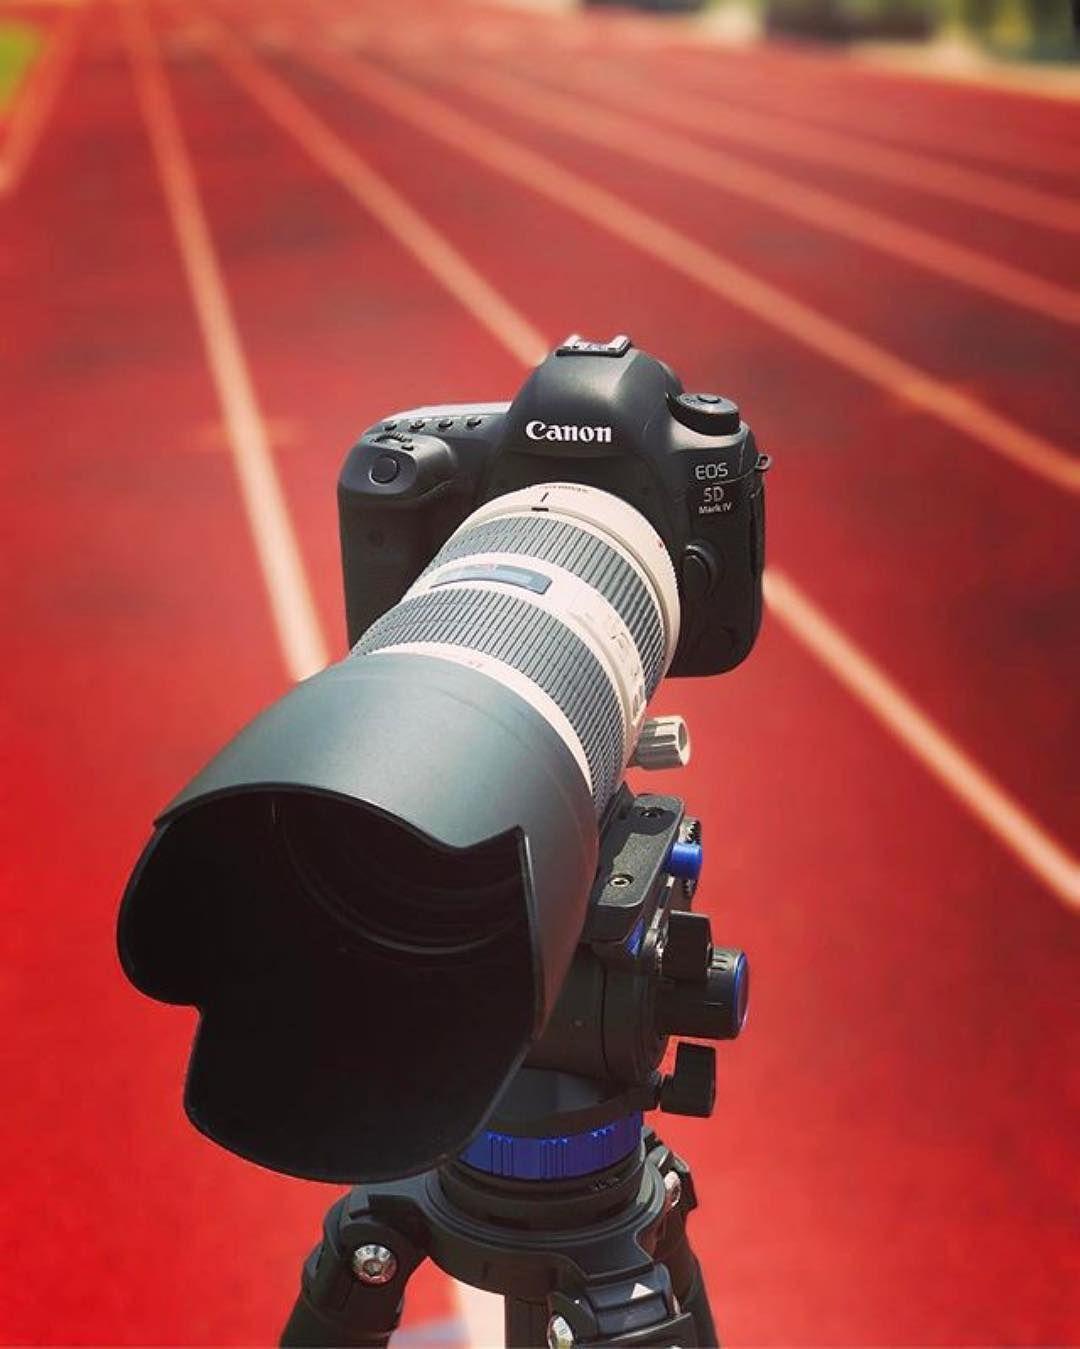 Sweet Dslr Action Setup Canon 5d Mark Iv Photo By